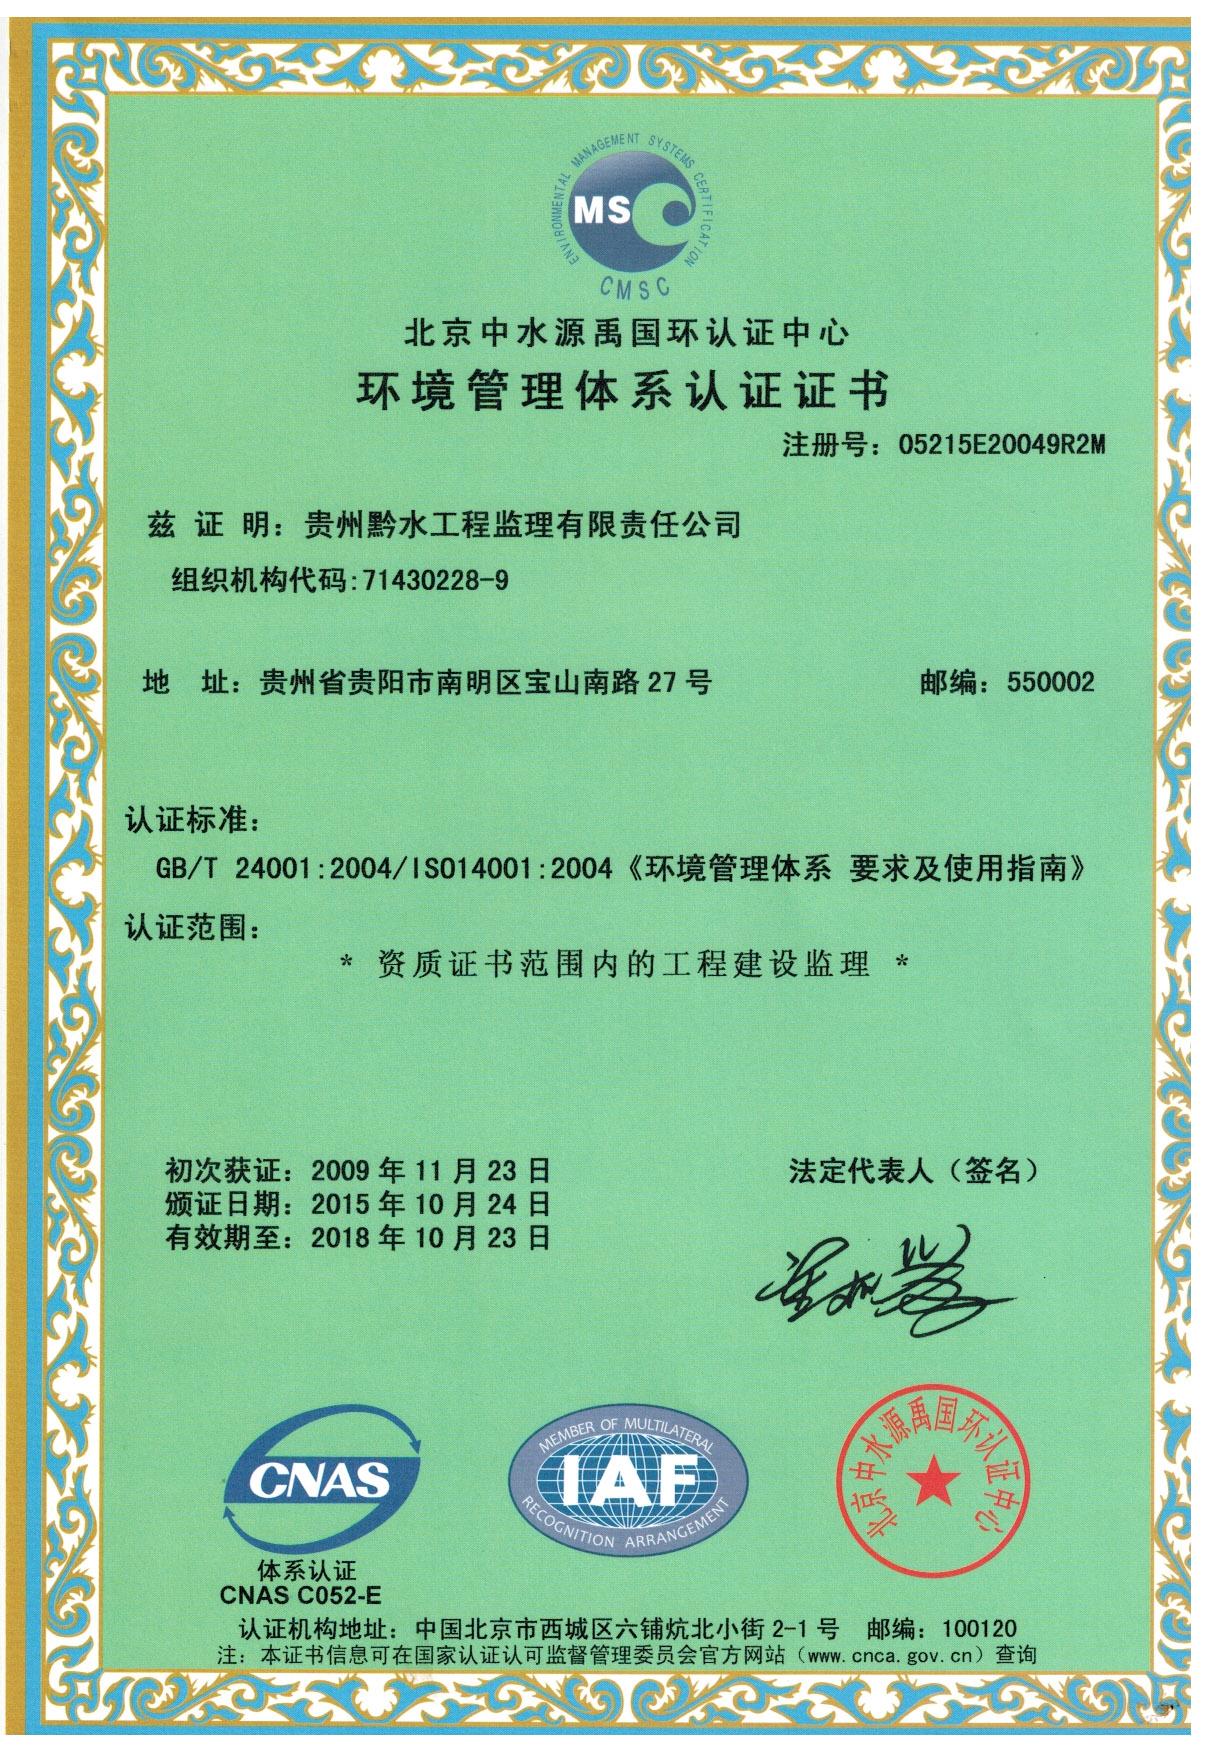 <span>环境管理体系认证证书2015</span>